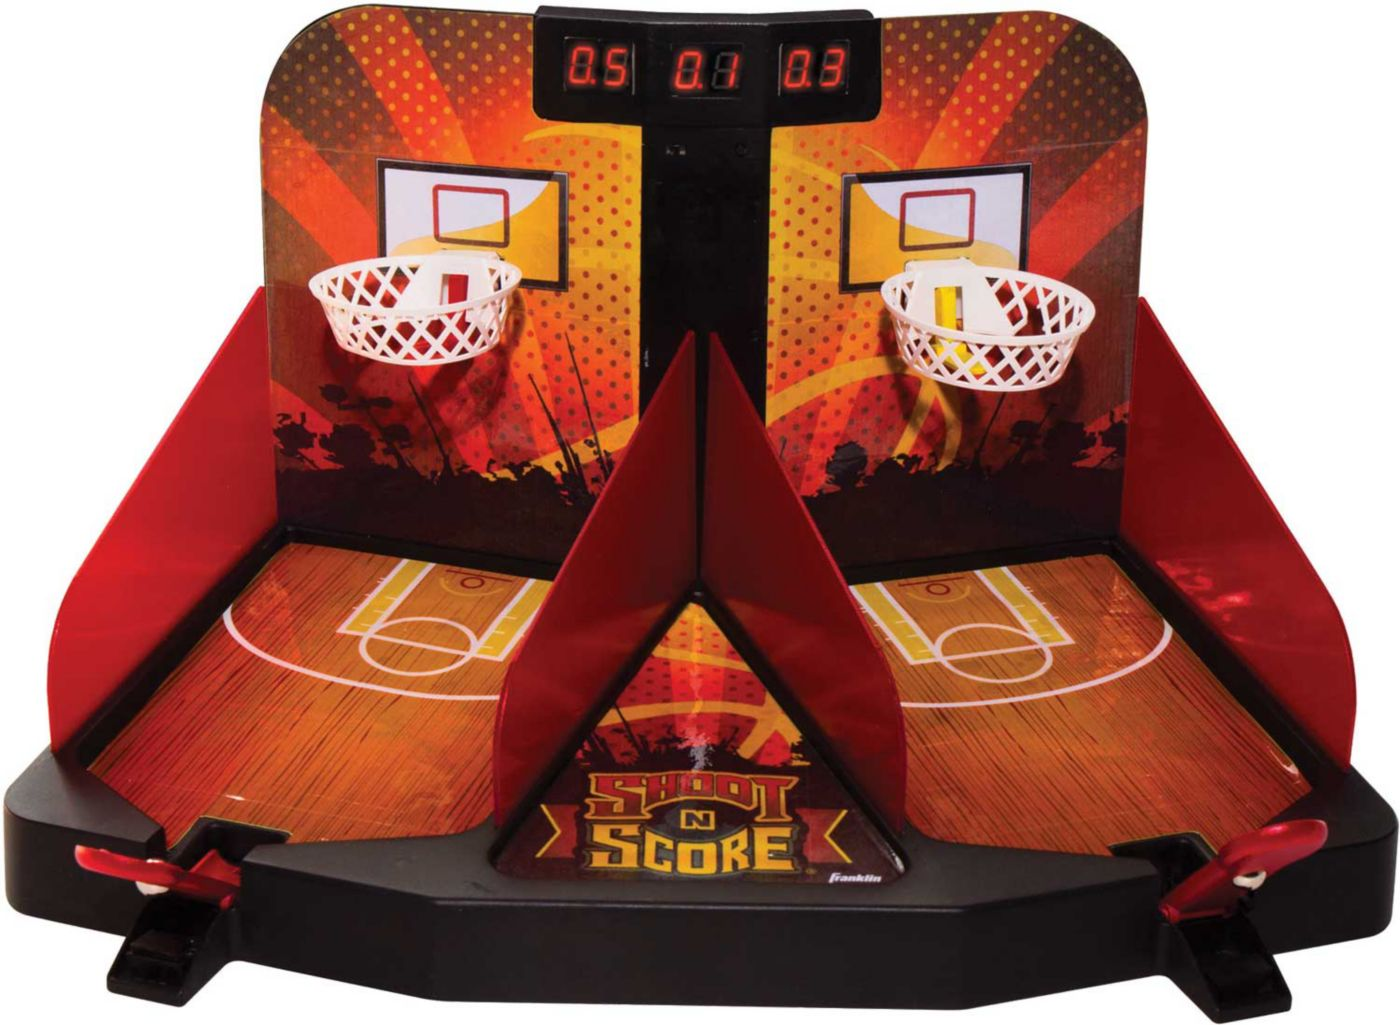 Franklin Sports Shoot N Score® Basketball Shootout